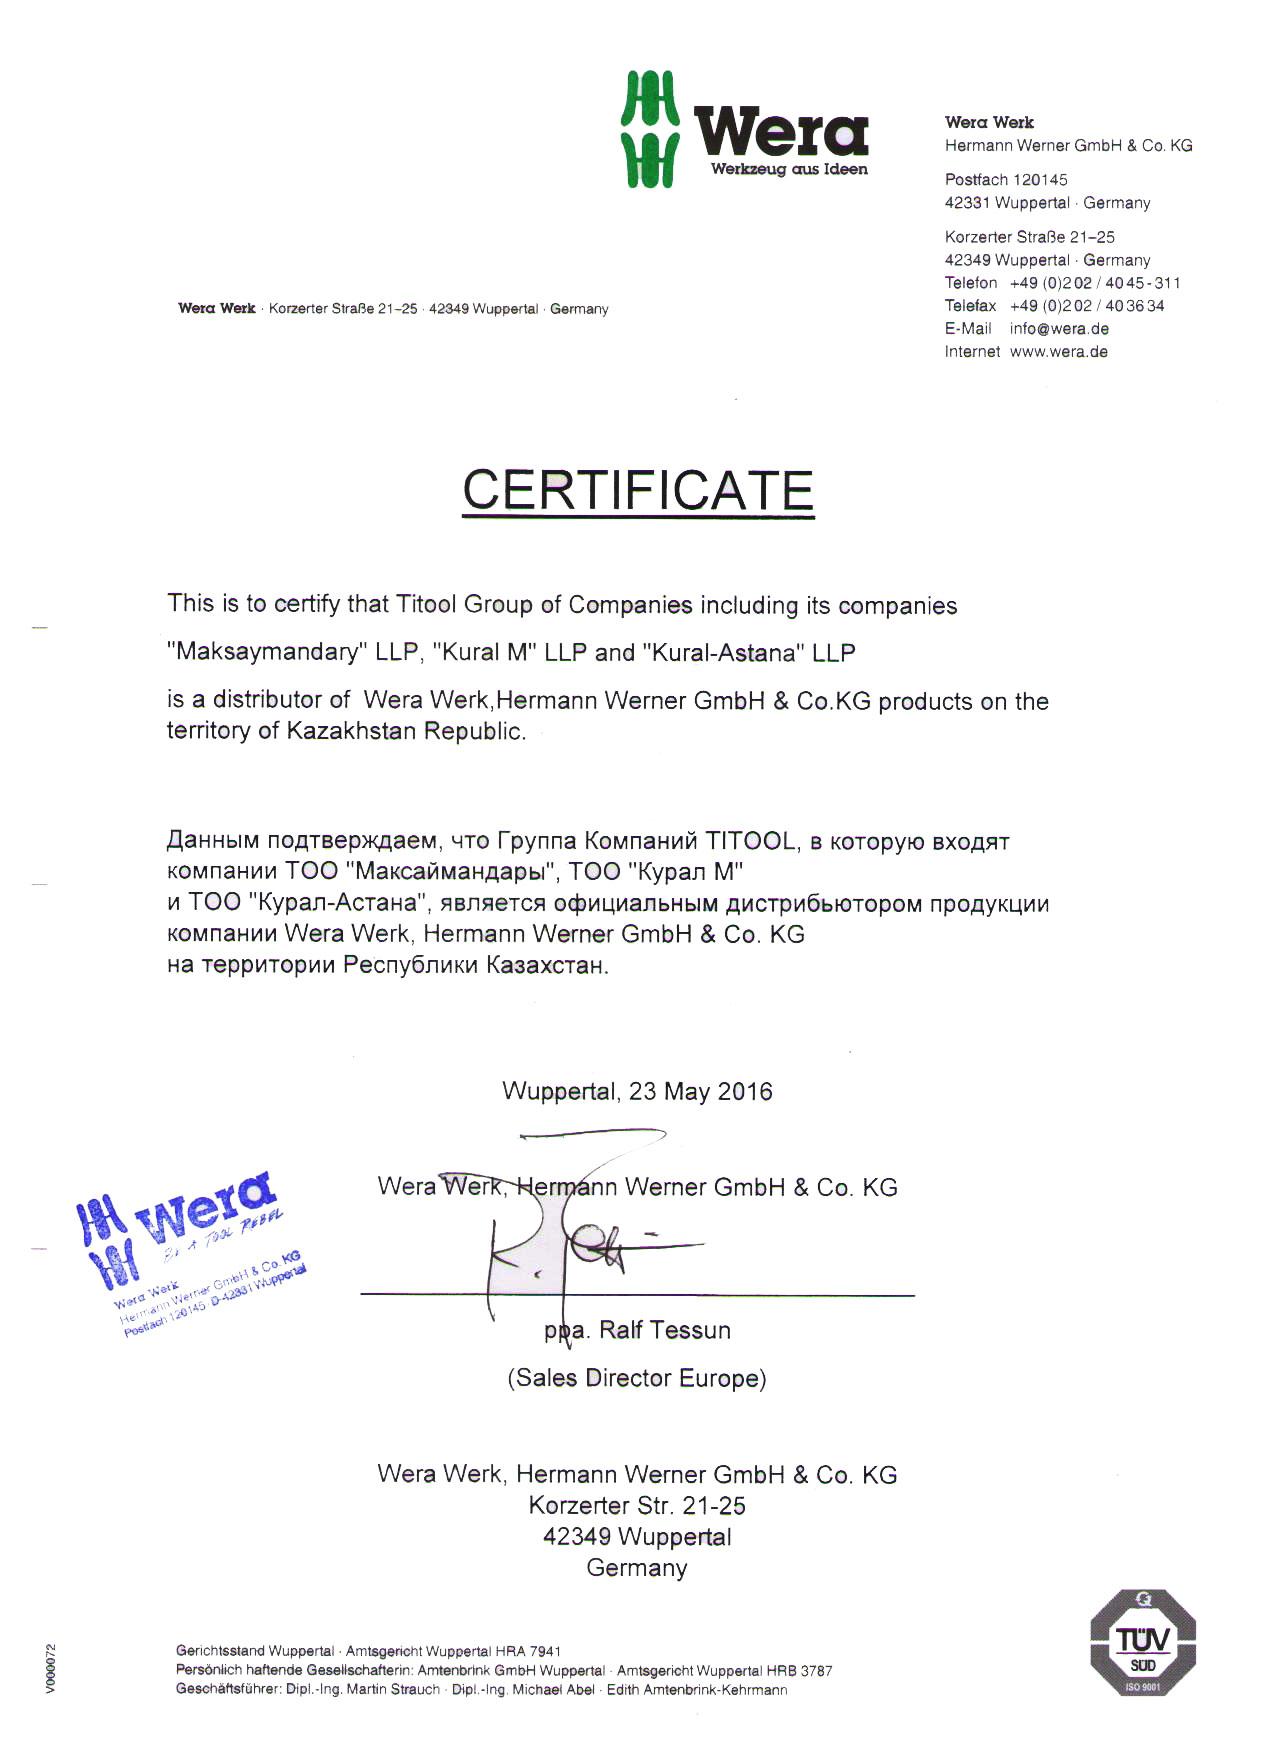 WERA-сертификат-2016.jpg